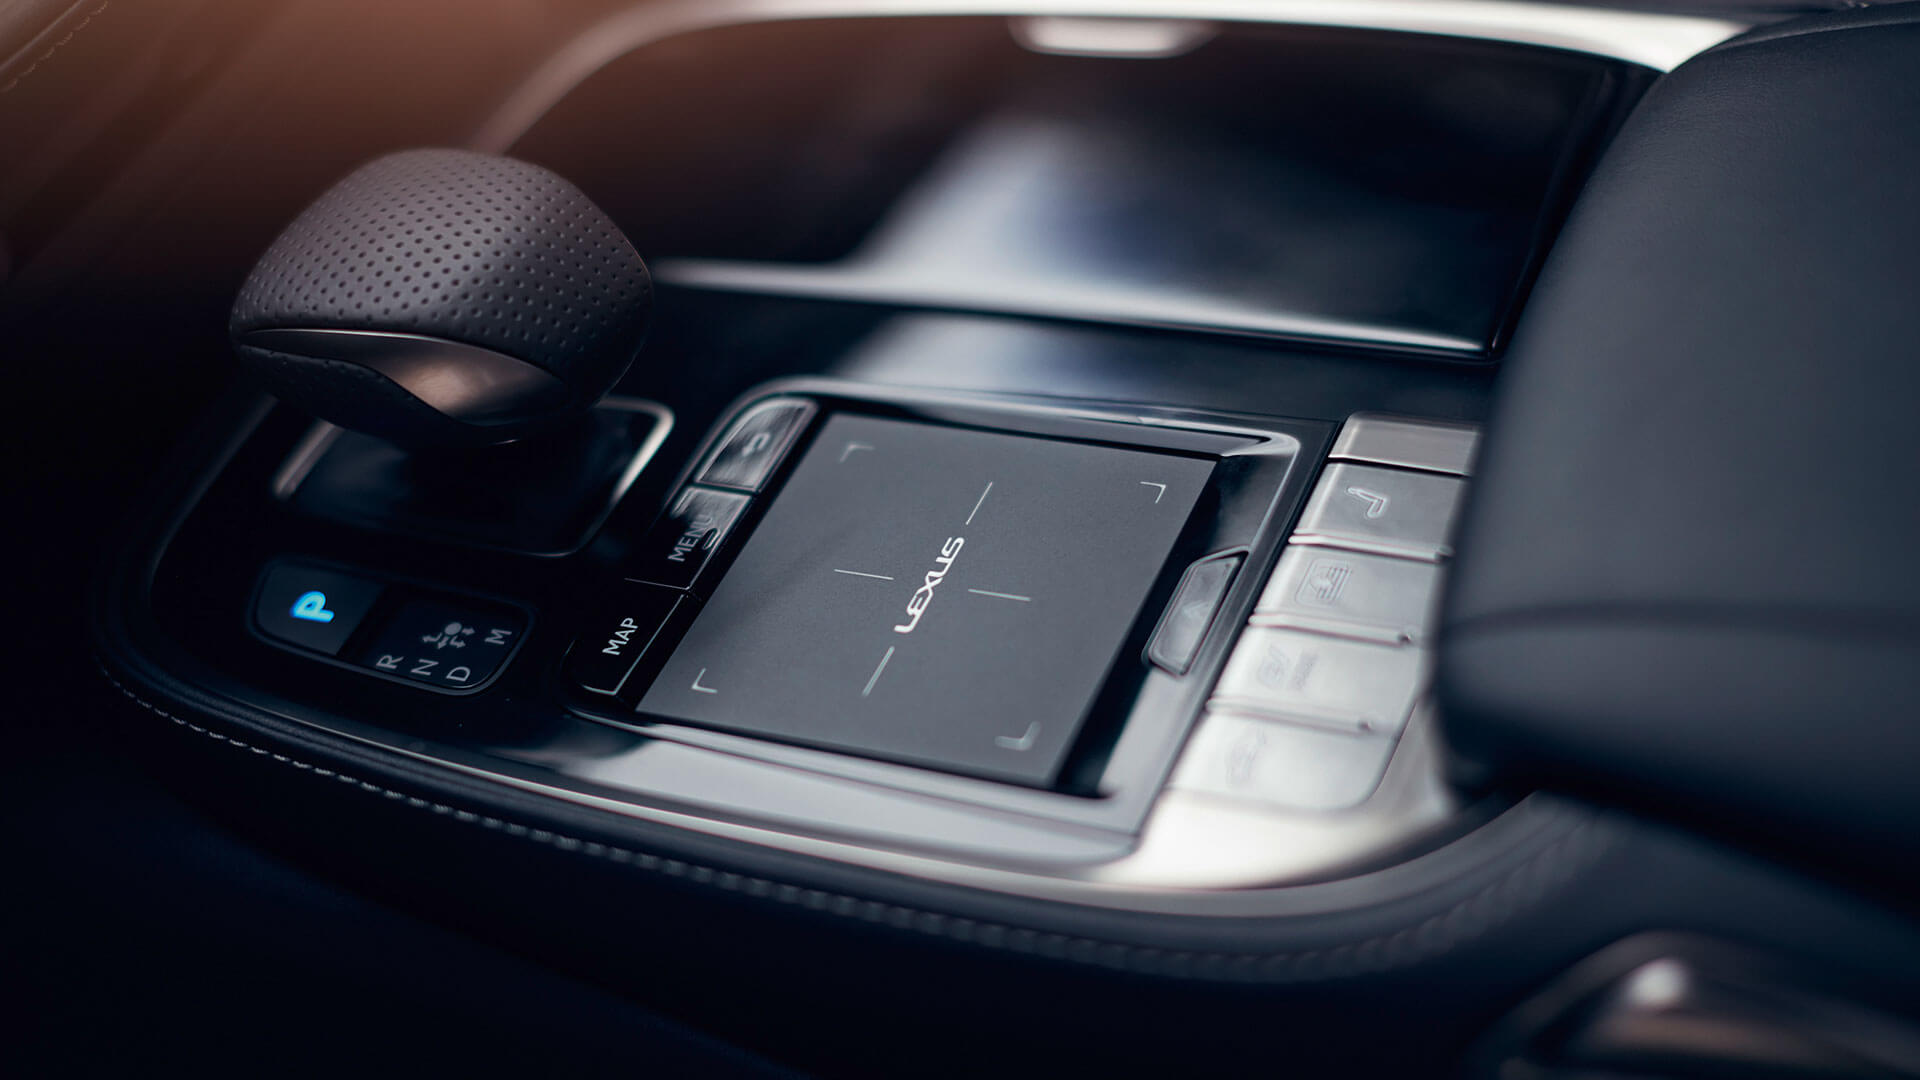 2018 lexus ls features touch pad